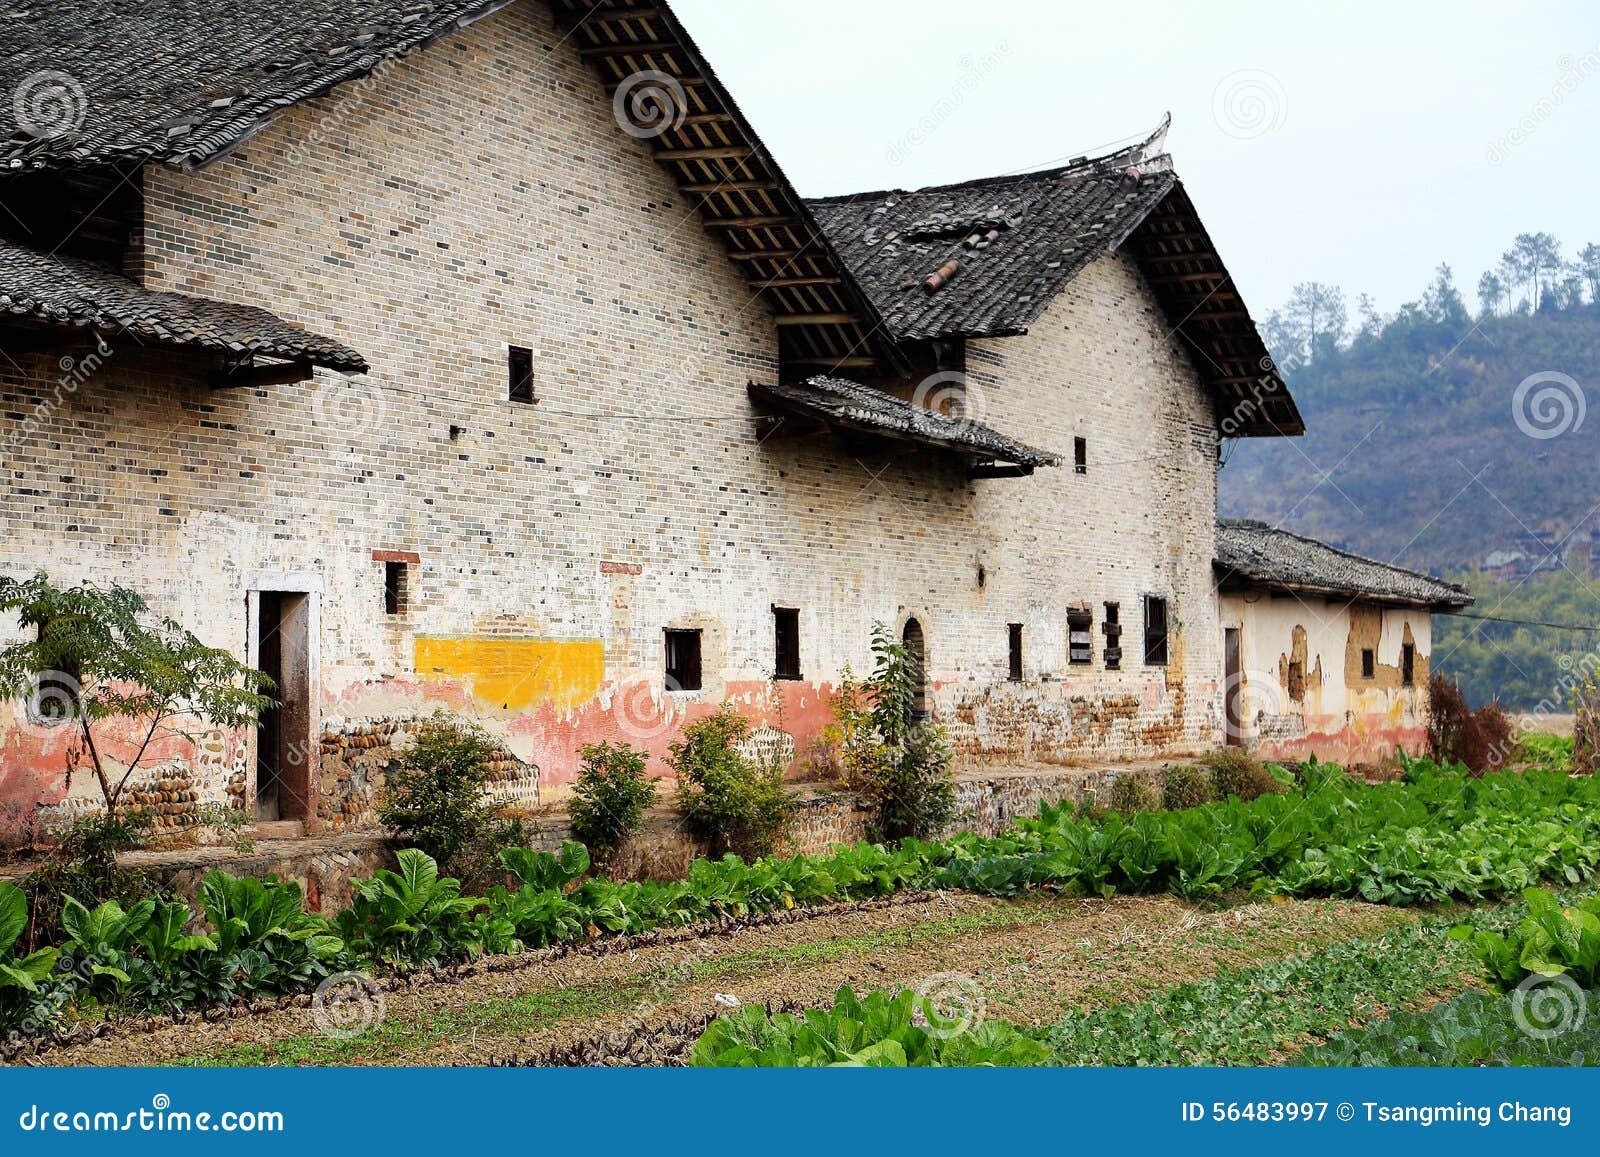 Village de culture de Donghuping en Chine